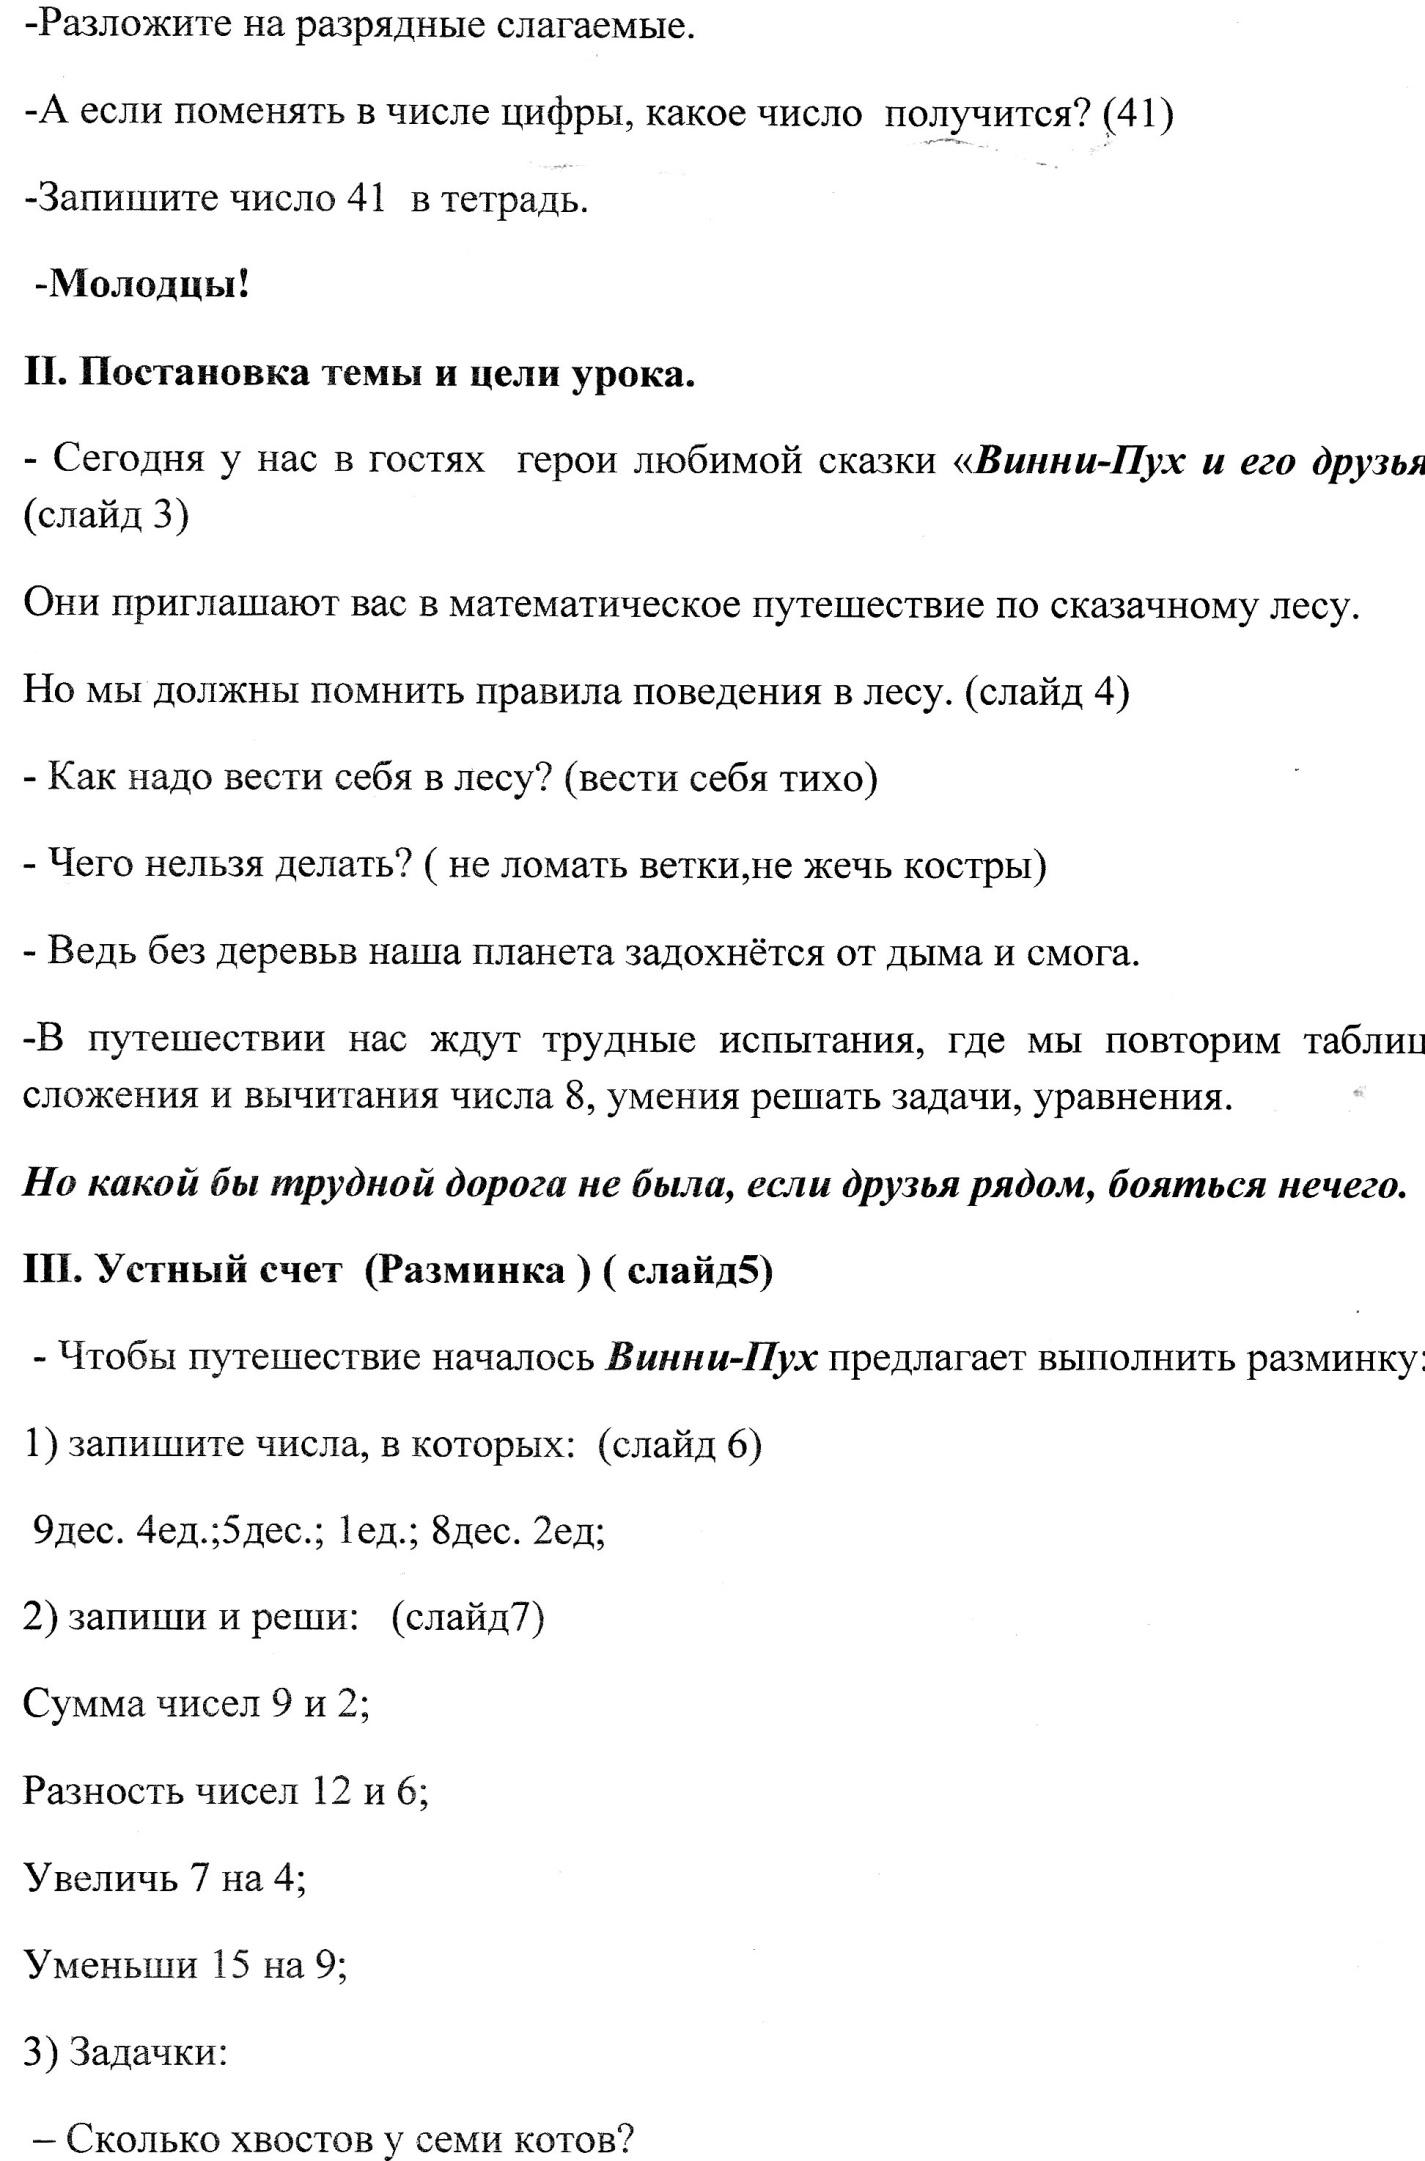 C:\Users\Жирафчик\AppData\Local\Microsoft\Windows\Temporary Internet Files\Content.Word\img063.jpg